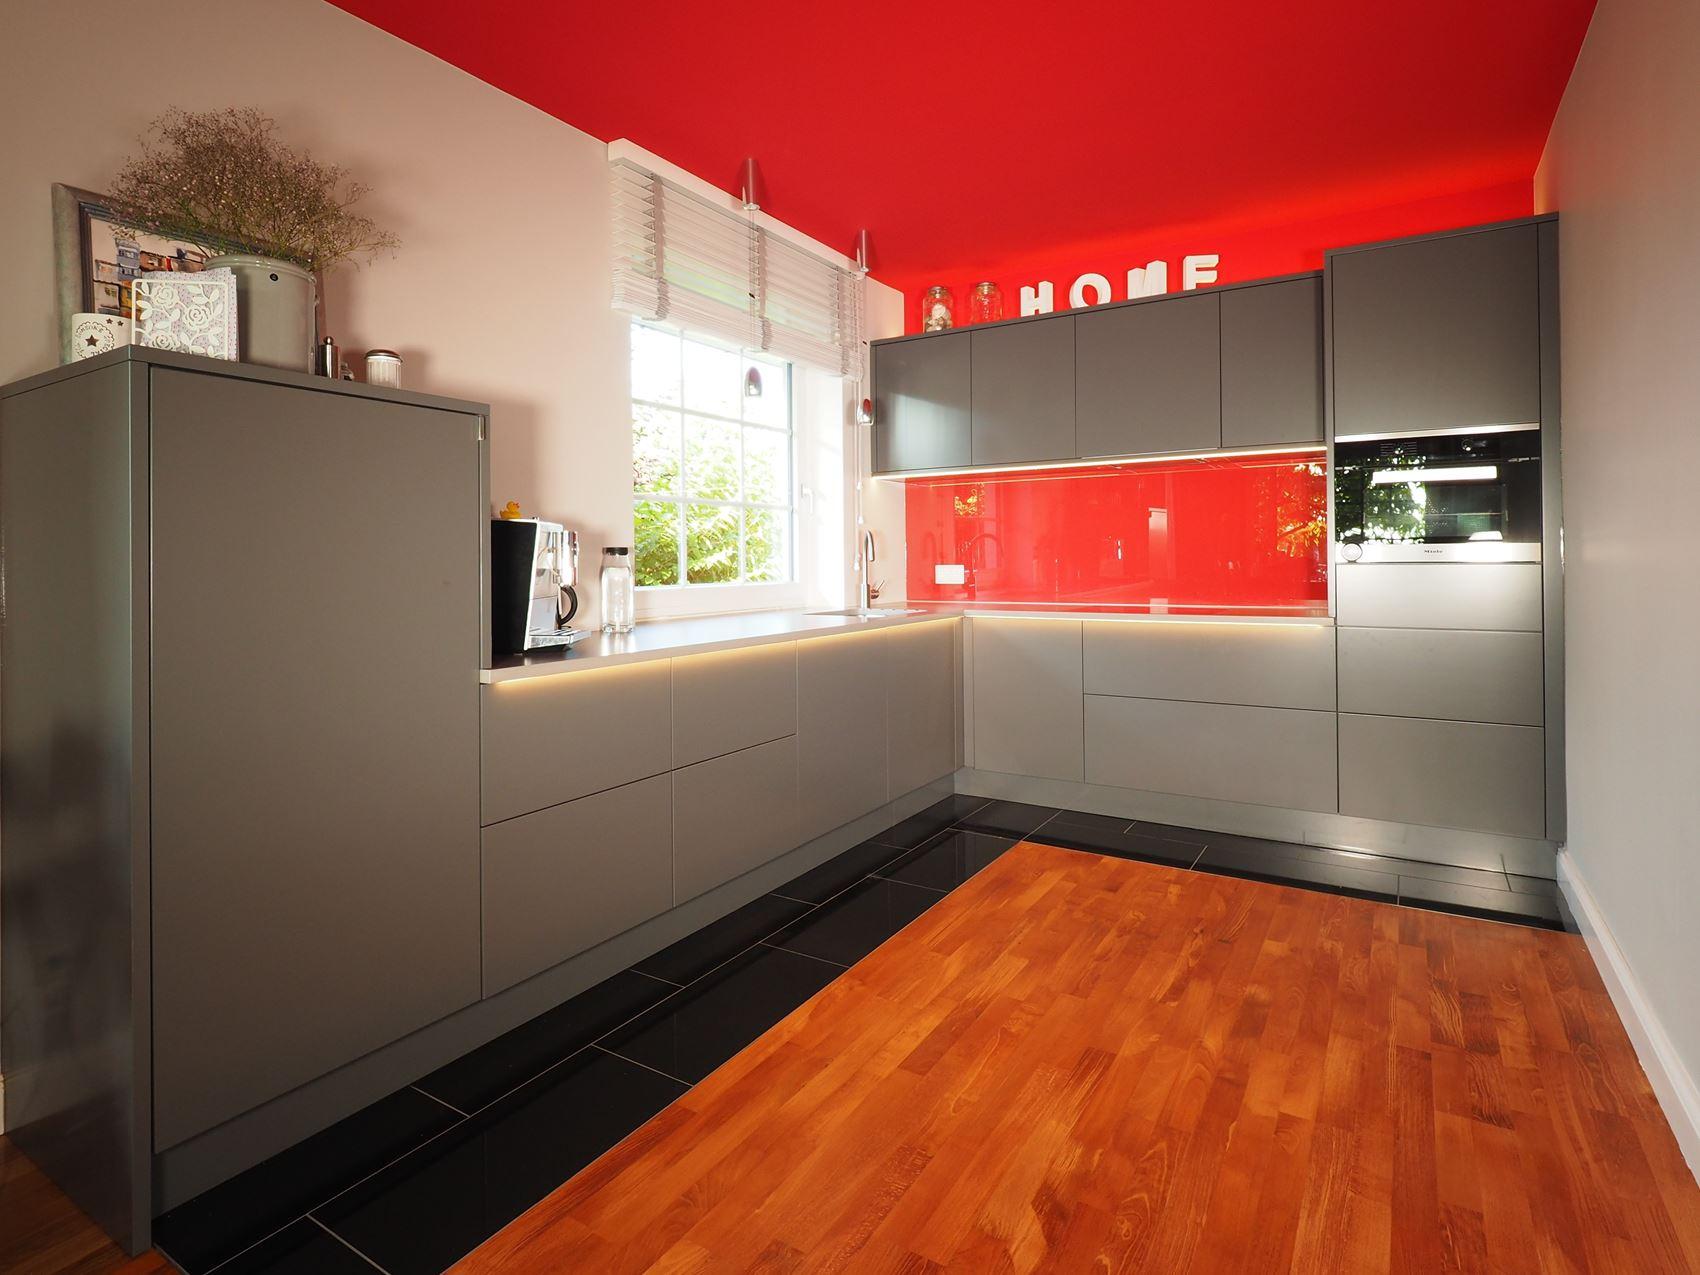 k che mit lackierten fronten hamburger m bel. Black Bedroom Furniture Sets. Home Design Ideas